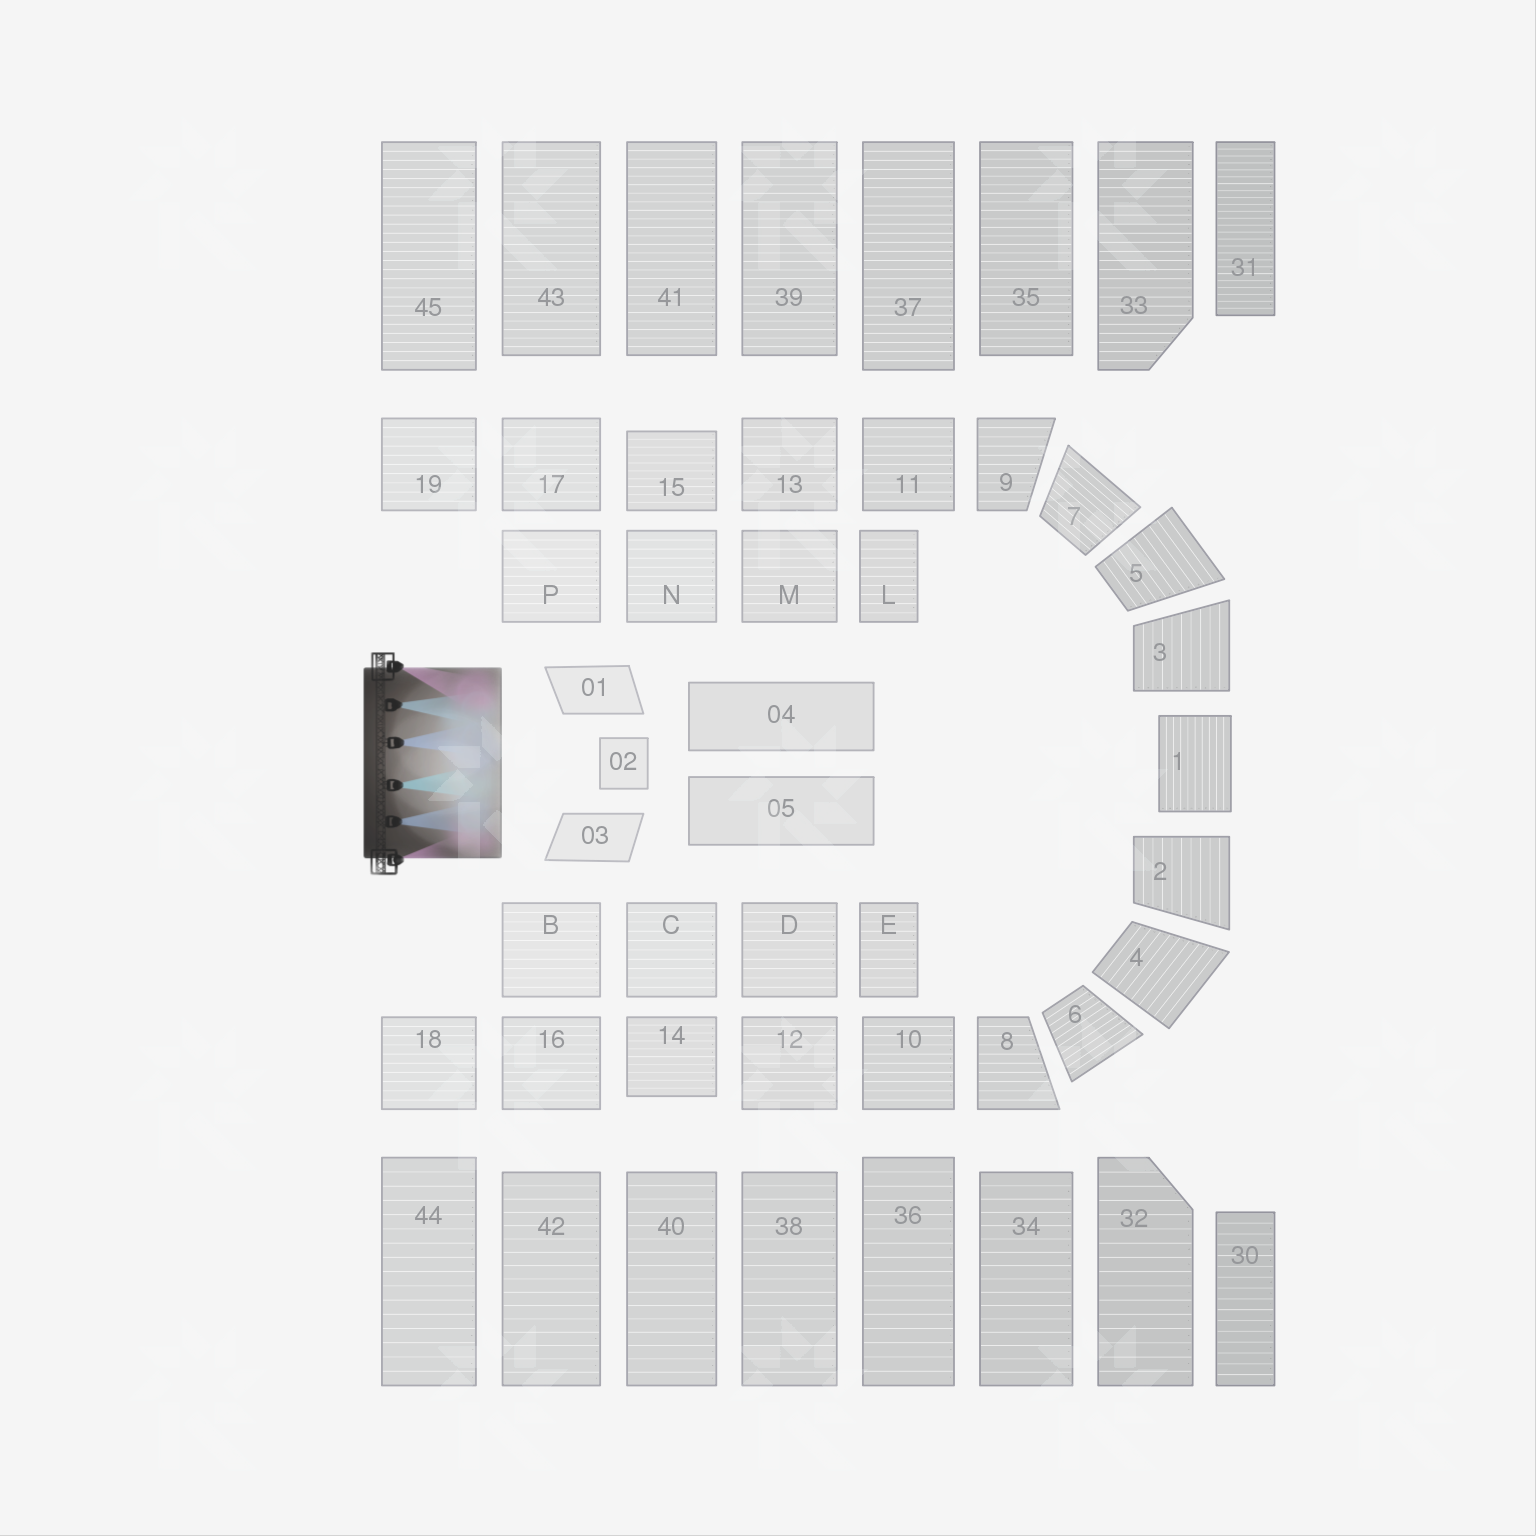 metrapark rimrock auto arena seating chart concerts carrie underwood concerts [ 1536 x 1536 Pixel ]